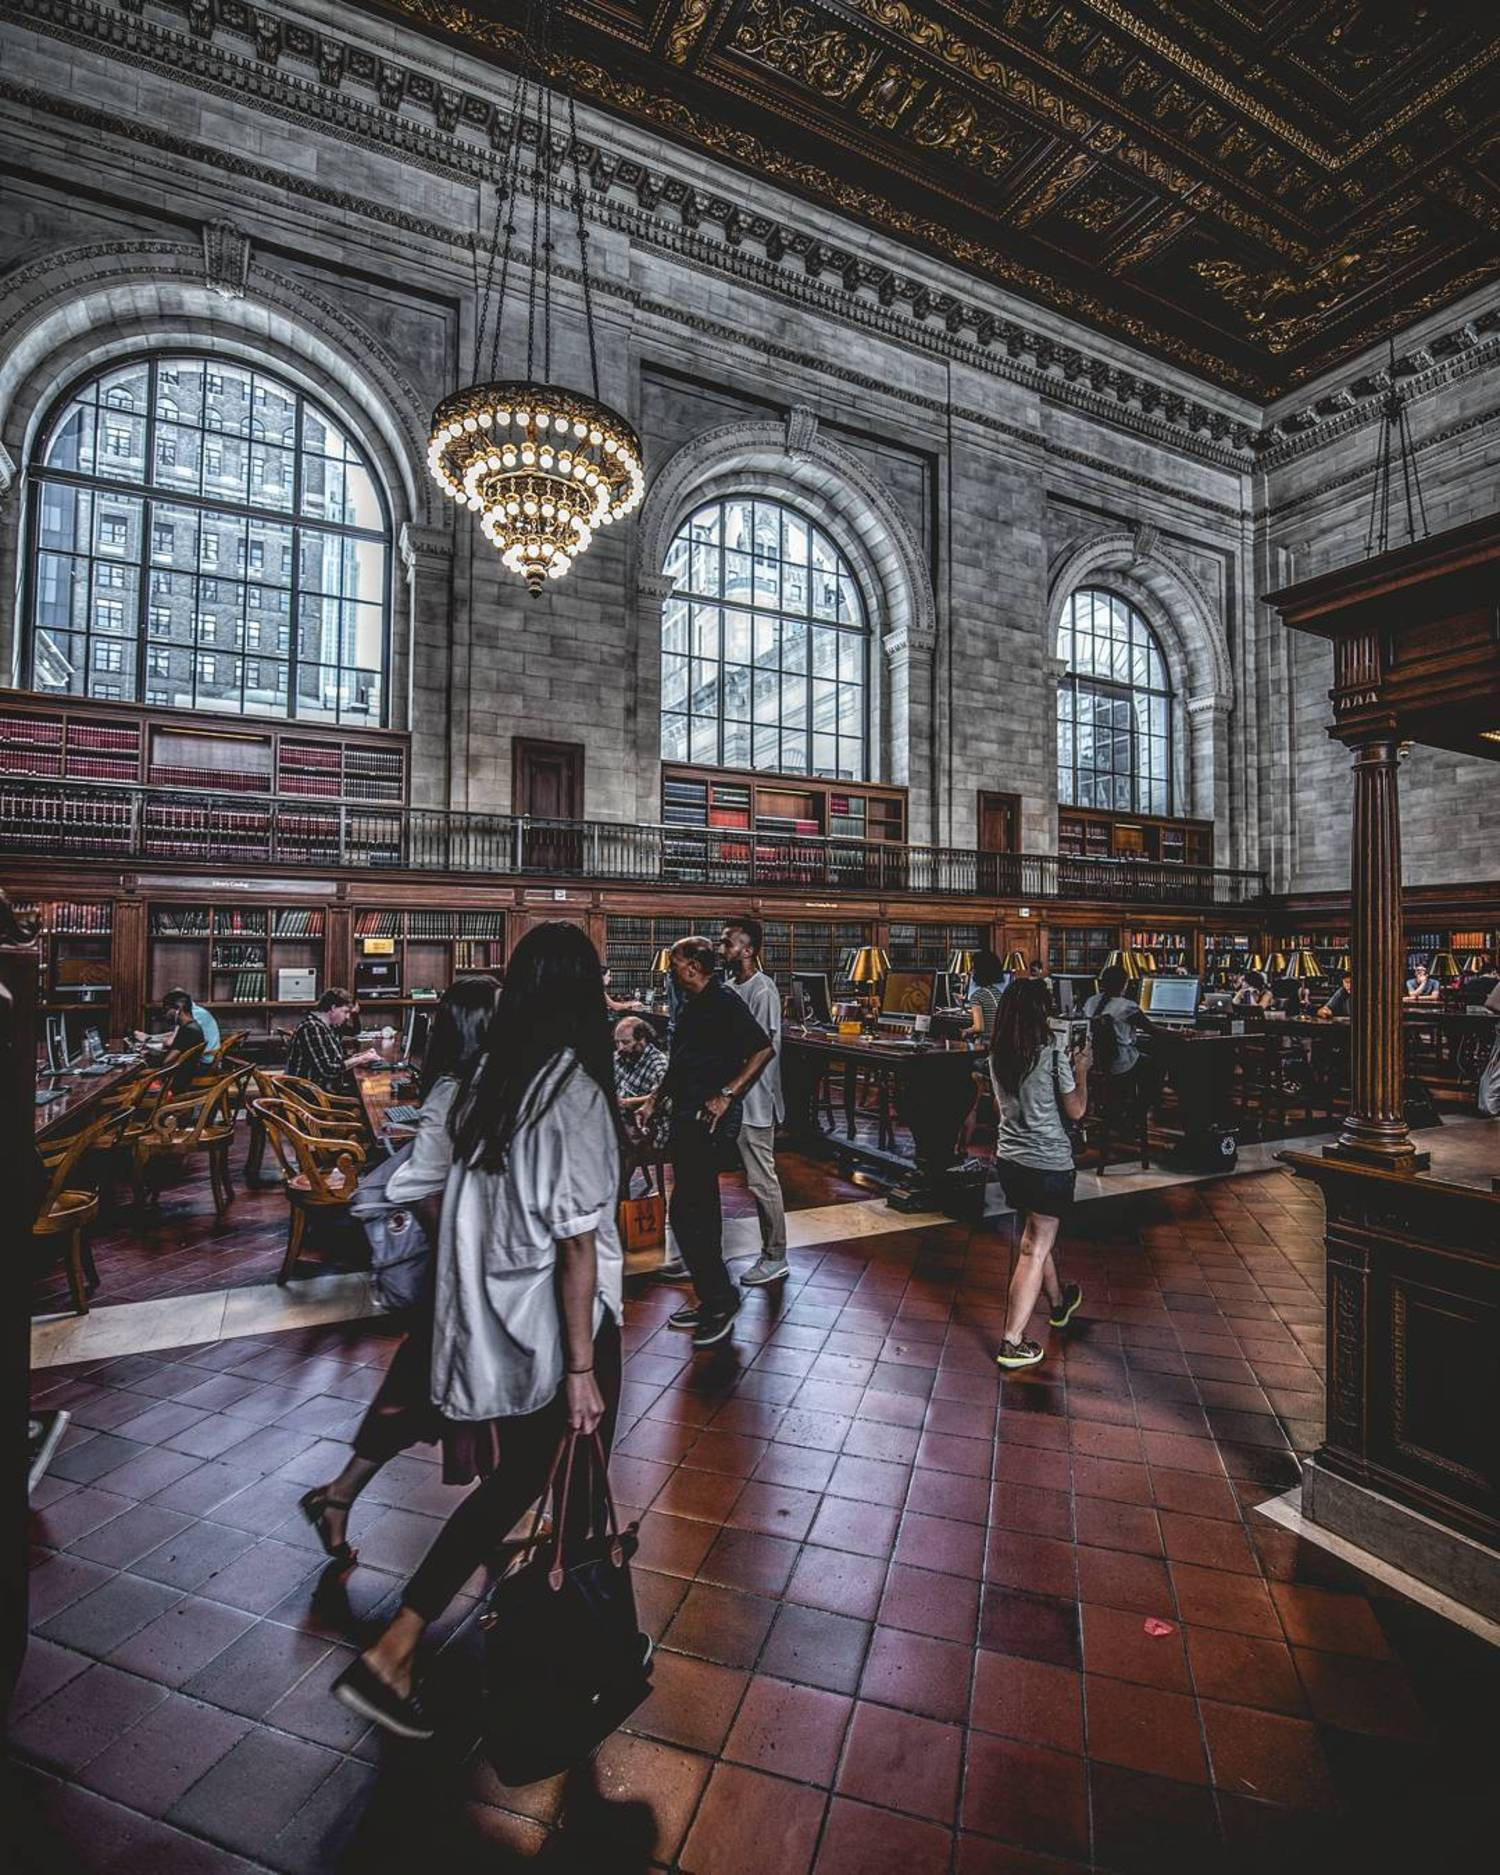 Stephen A. Schwarzman Building, New York Public Library, New York, New York